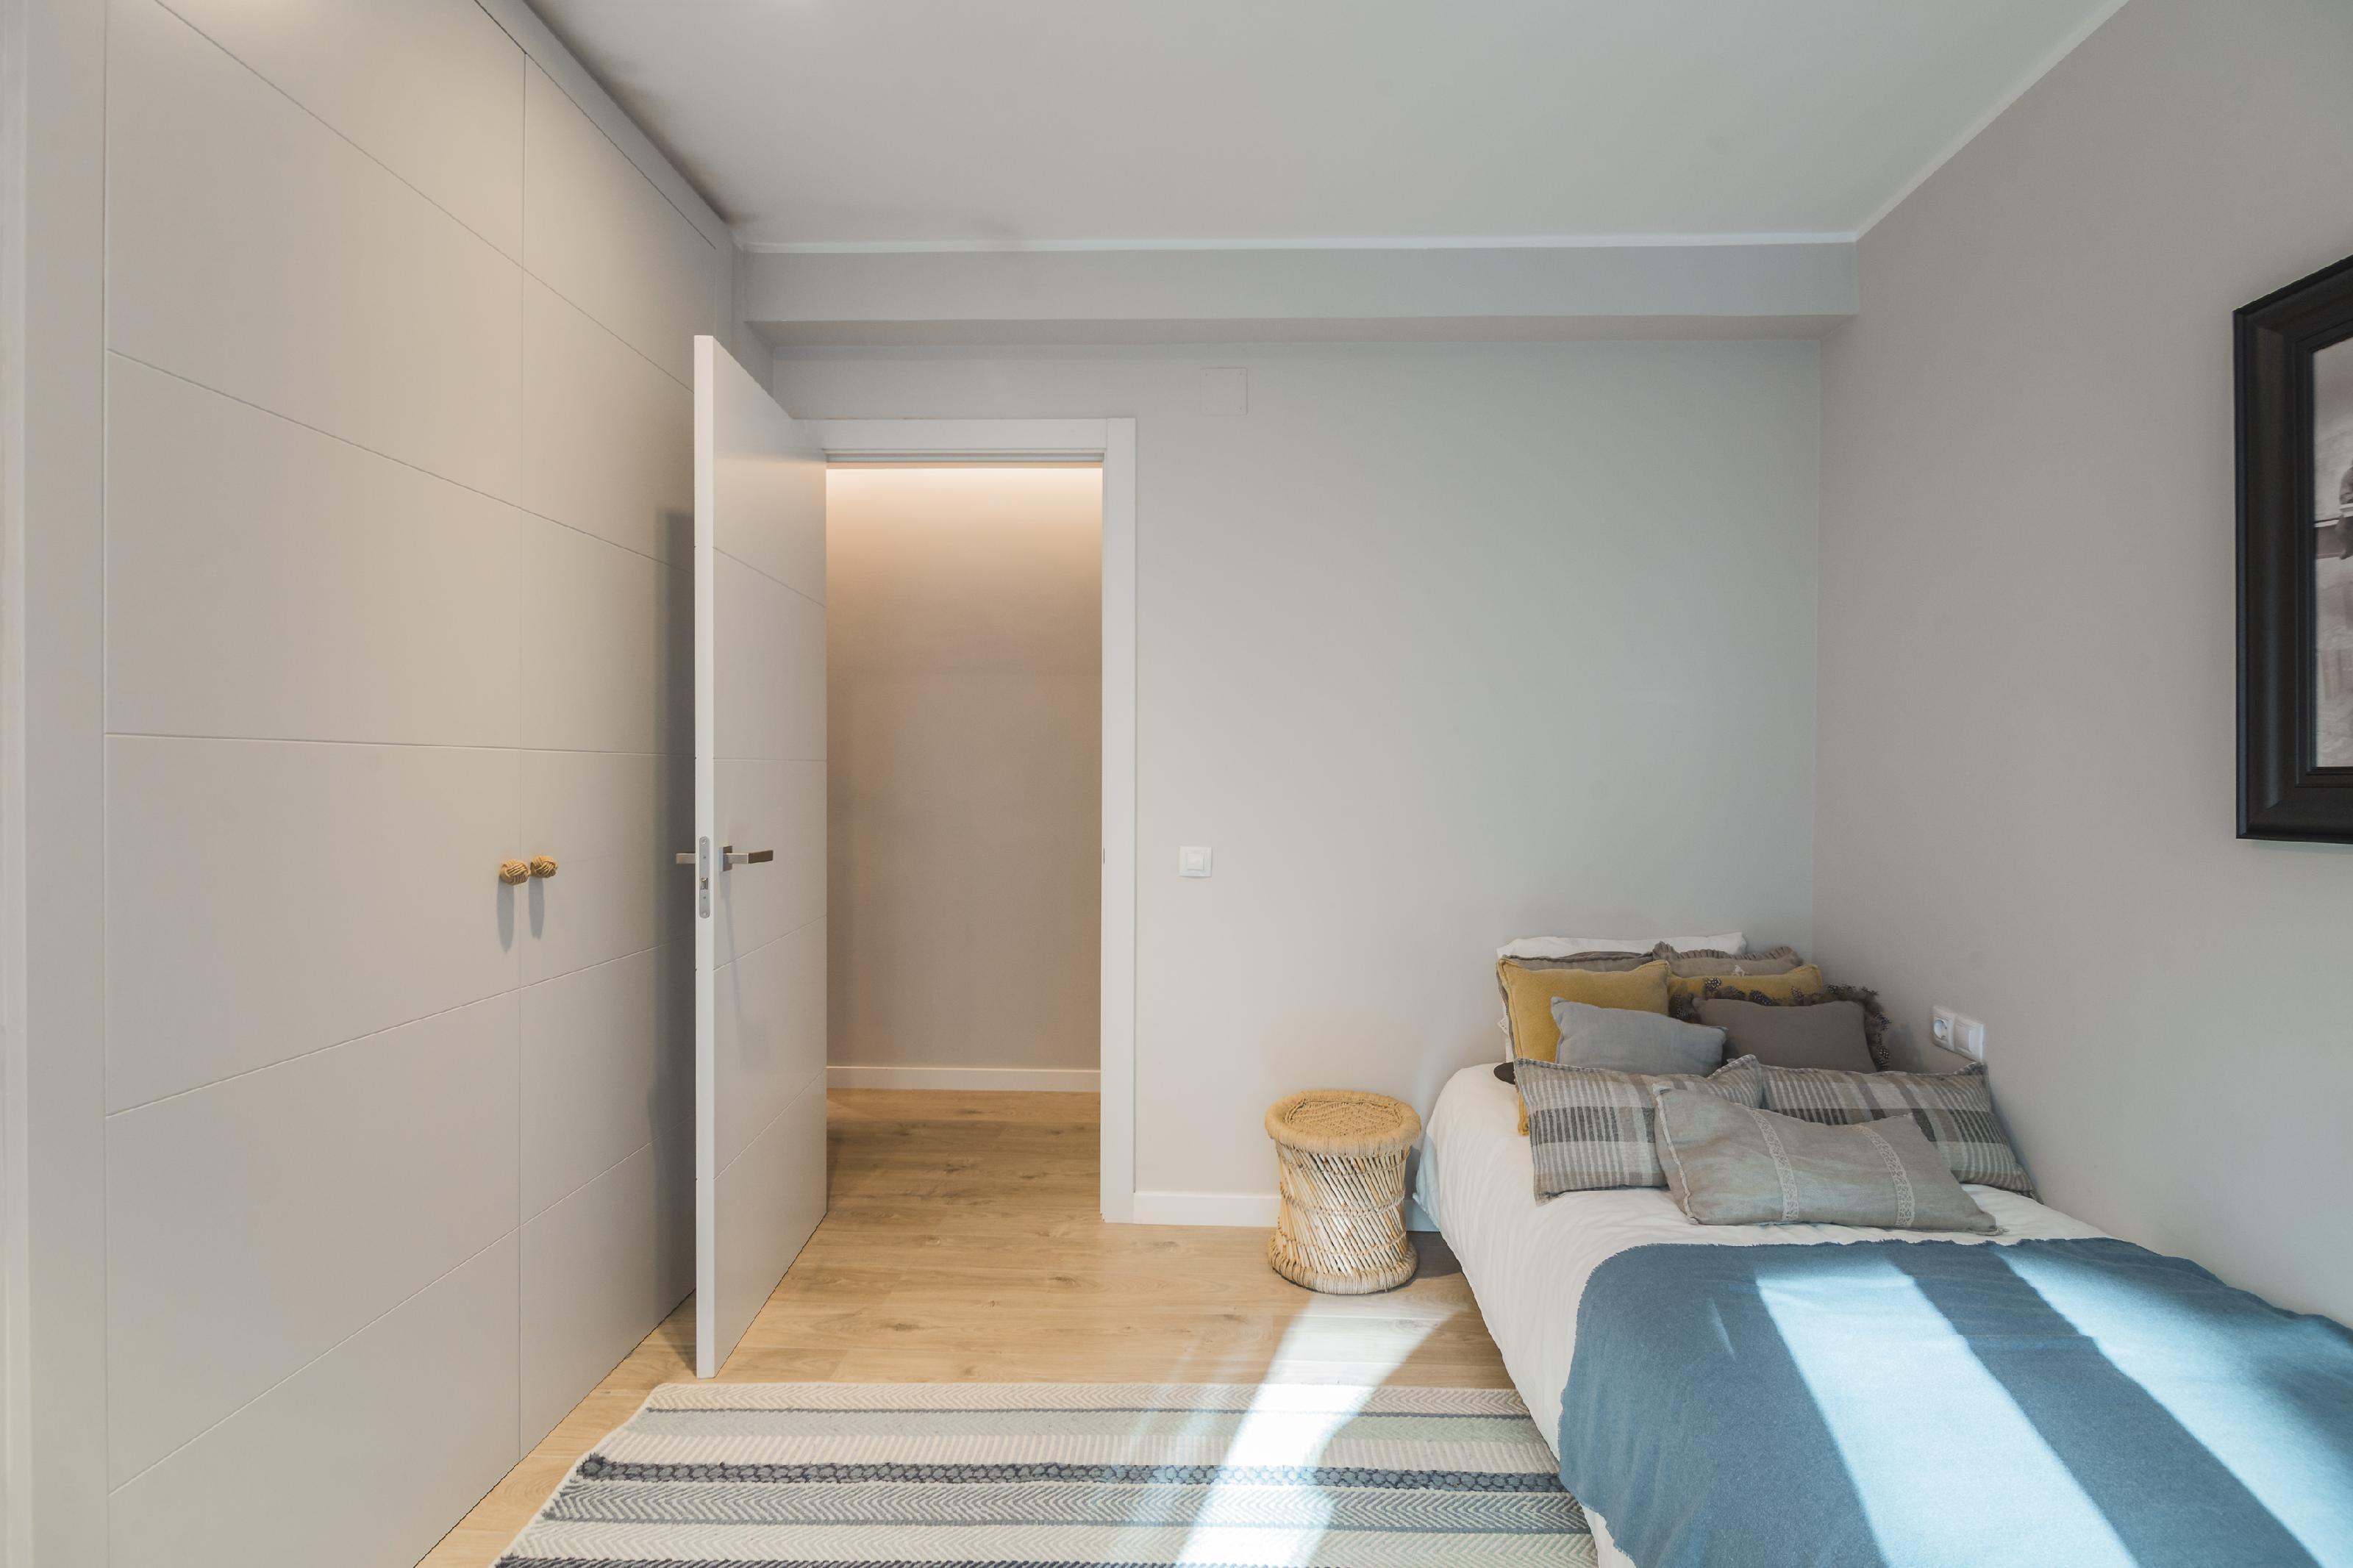 244392 Flat for sale in Sarrià-Sant Gervasi, Sant Gervasi-Galvany 28